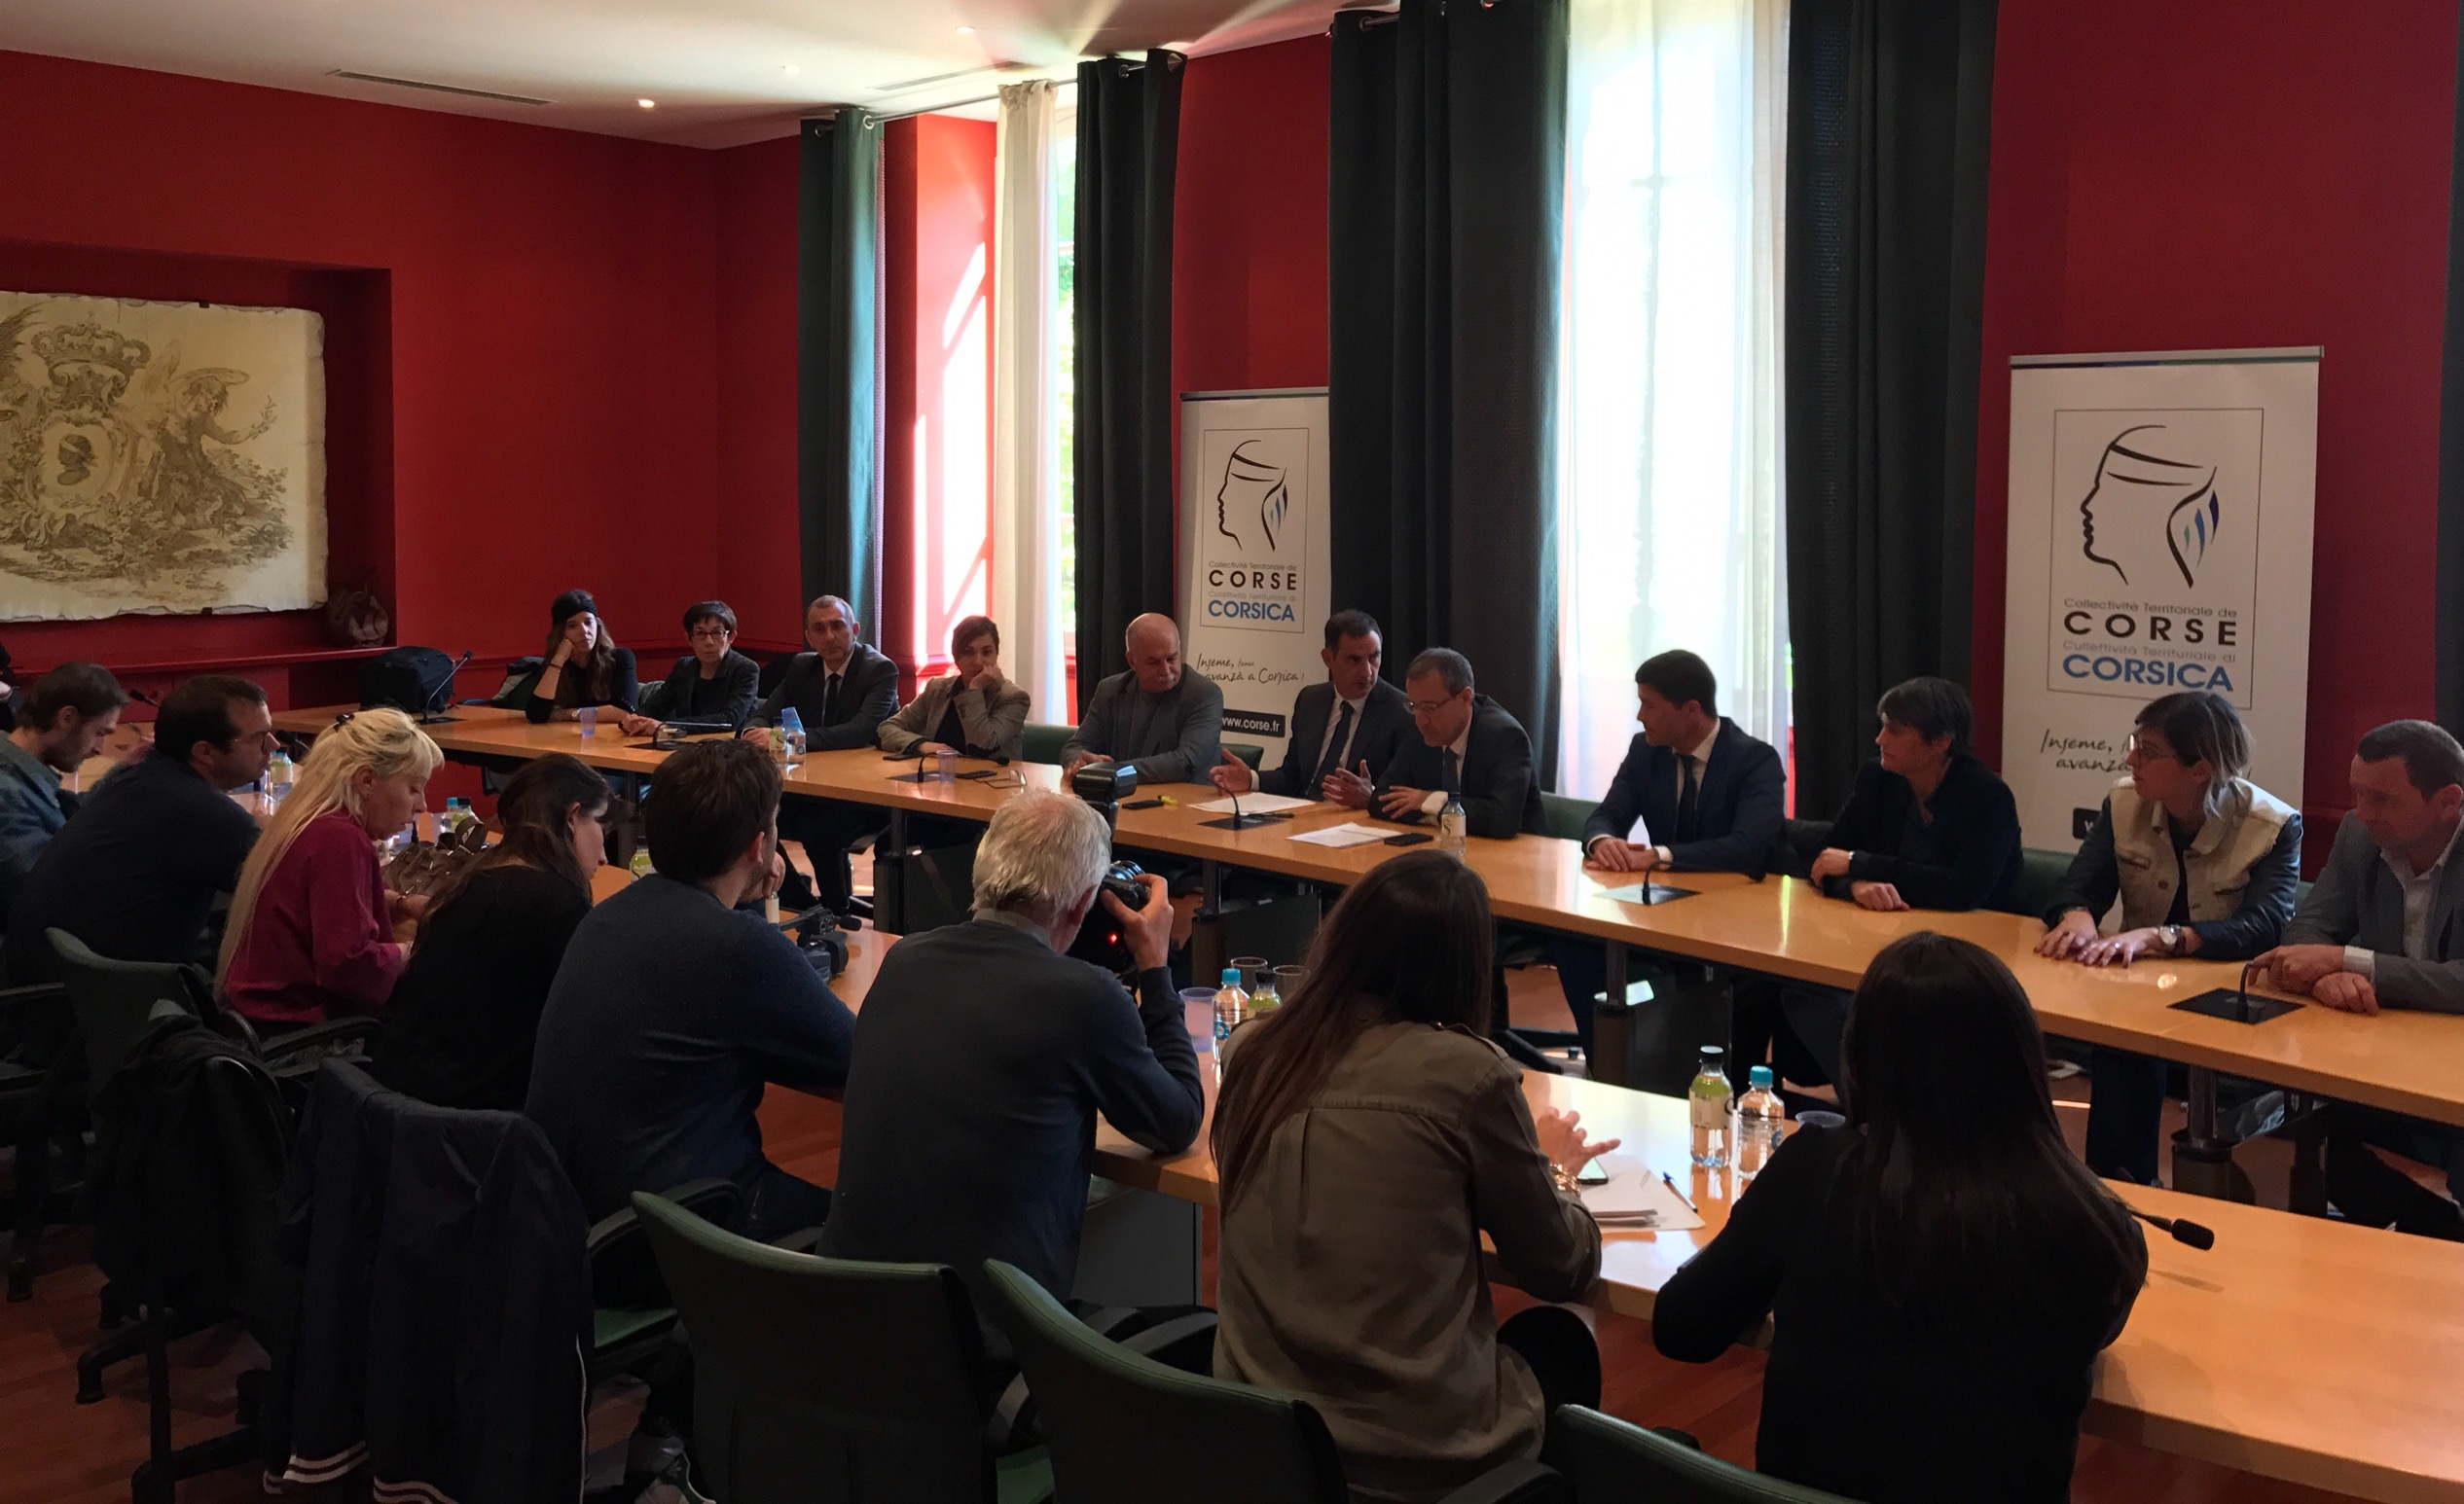 """Pace, ritornu è libertà"" : Une initiative en faveur des prisonniers et recherchés"